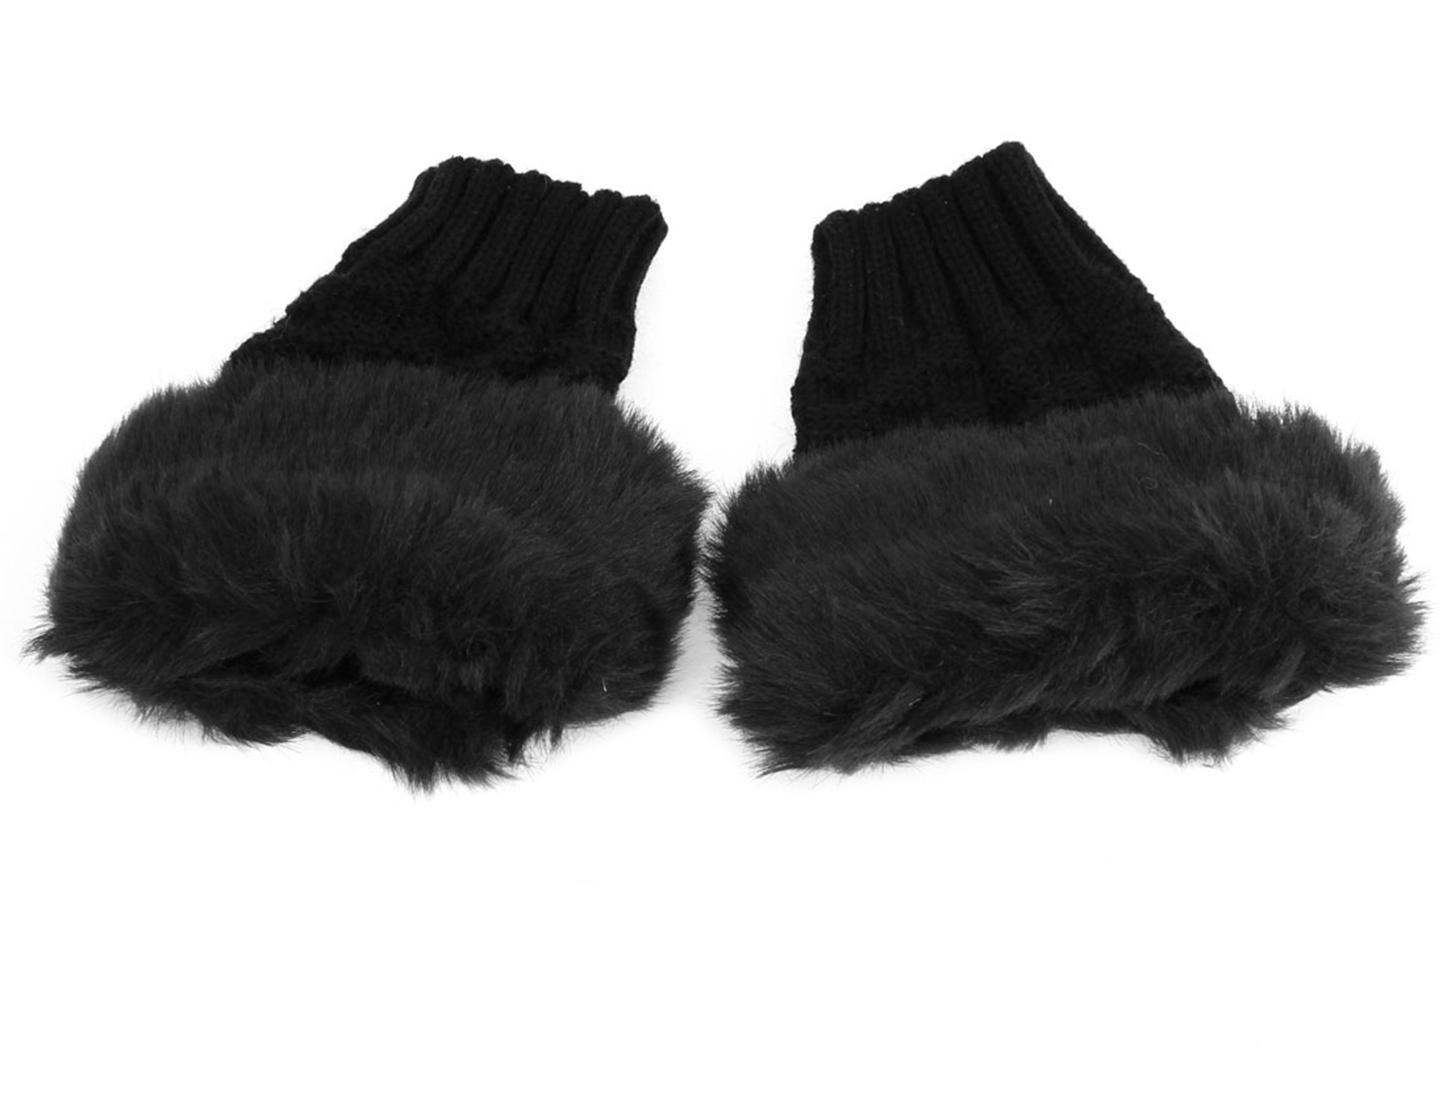 Woman Pair Black Faux Fur Thumb Hole Winter Wrist Fingerless Gloves